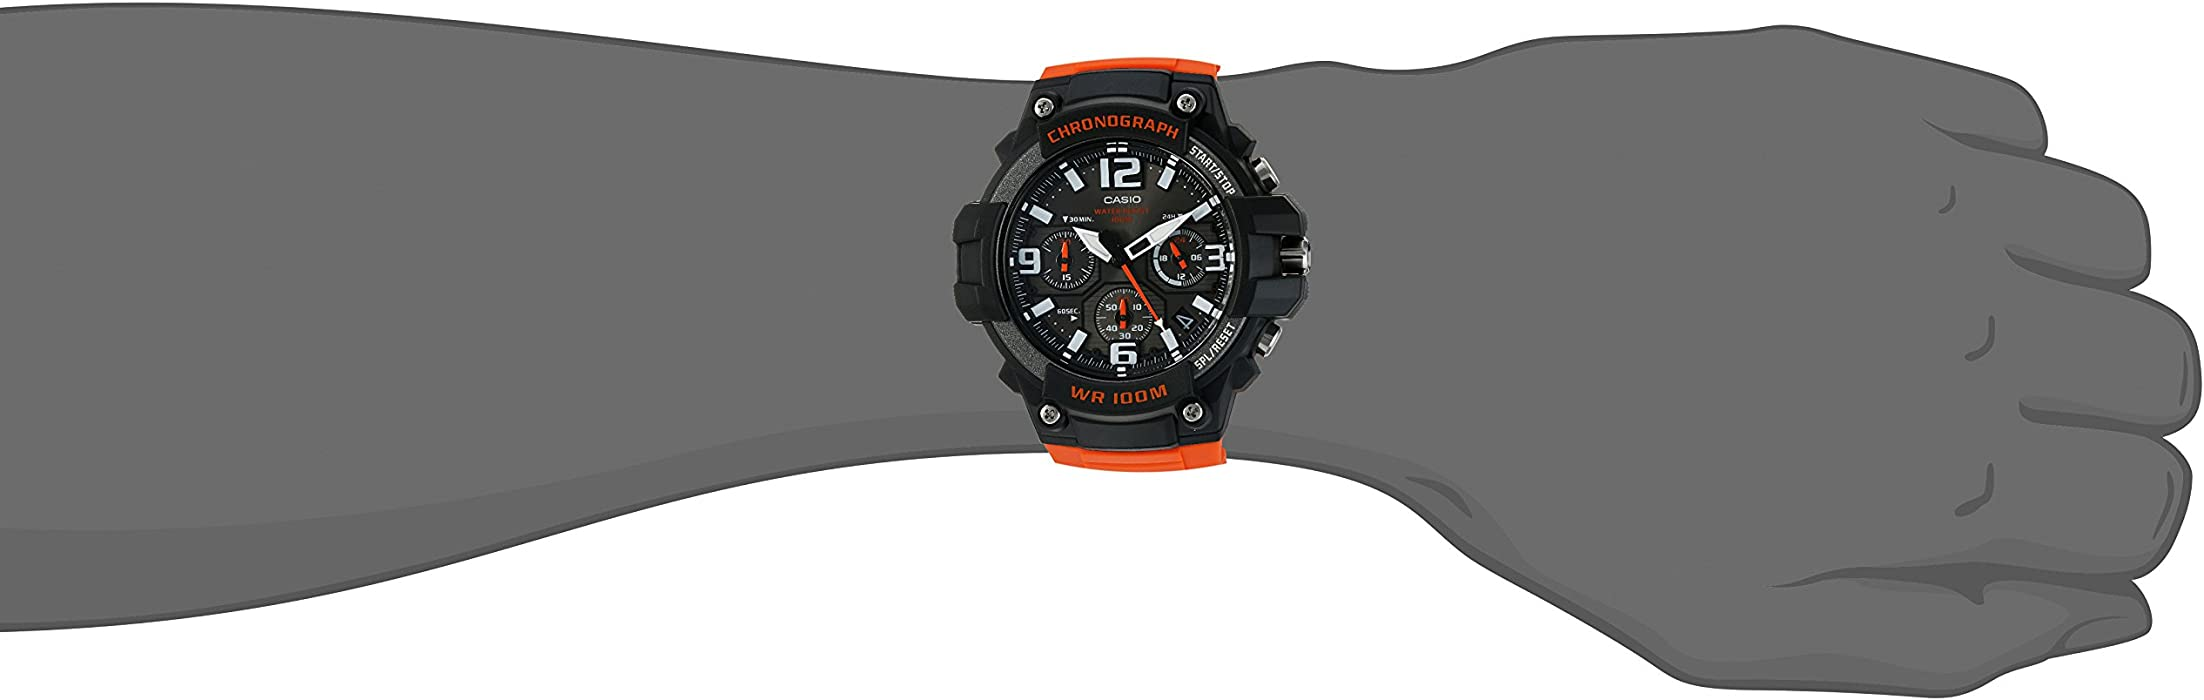 Casio Men Heavy Duty Chronograph Quartz Stainless Steel and Resin Casual Watch ColorOrange Model MCW100H4AV